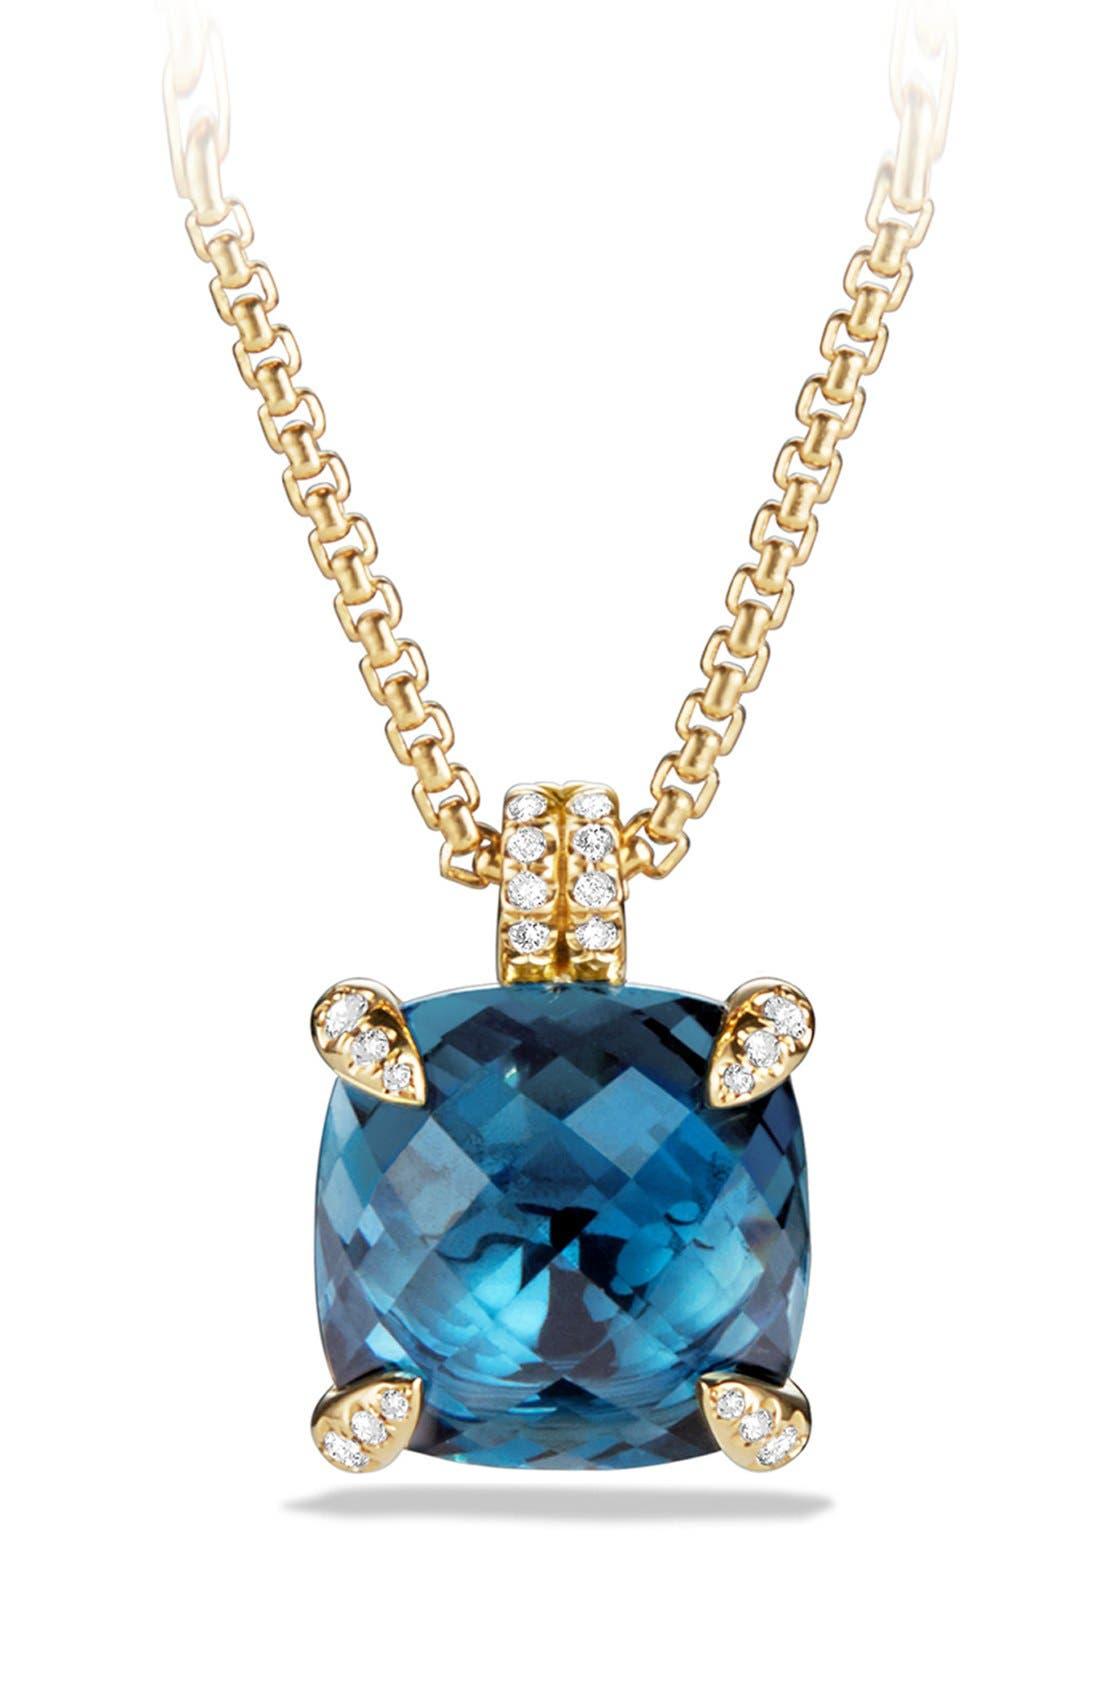 'Châtelaine' Pendant Necklace with Diamonds in 18K Gold,                         Main,                         color, HAMPTON BLUE TOPAZ